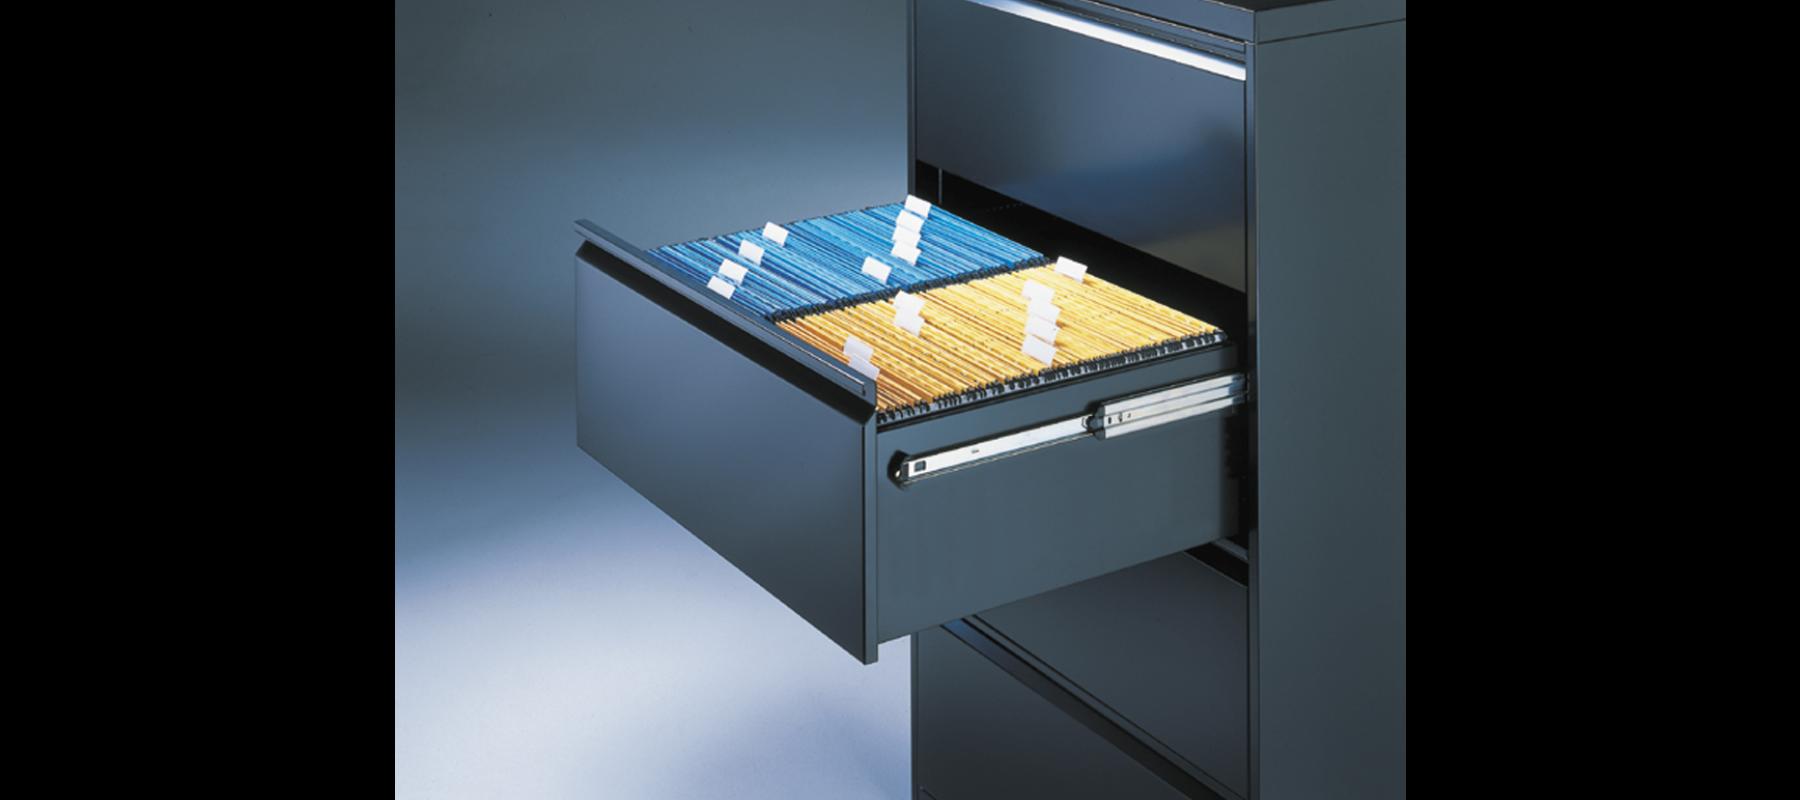 metalowe meble biurowe szafy szufladowe cp detale - 02